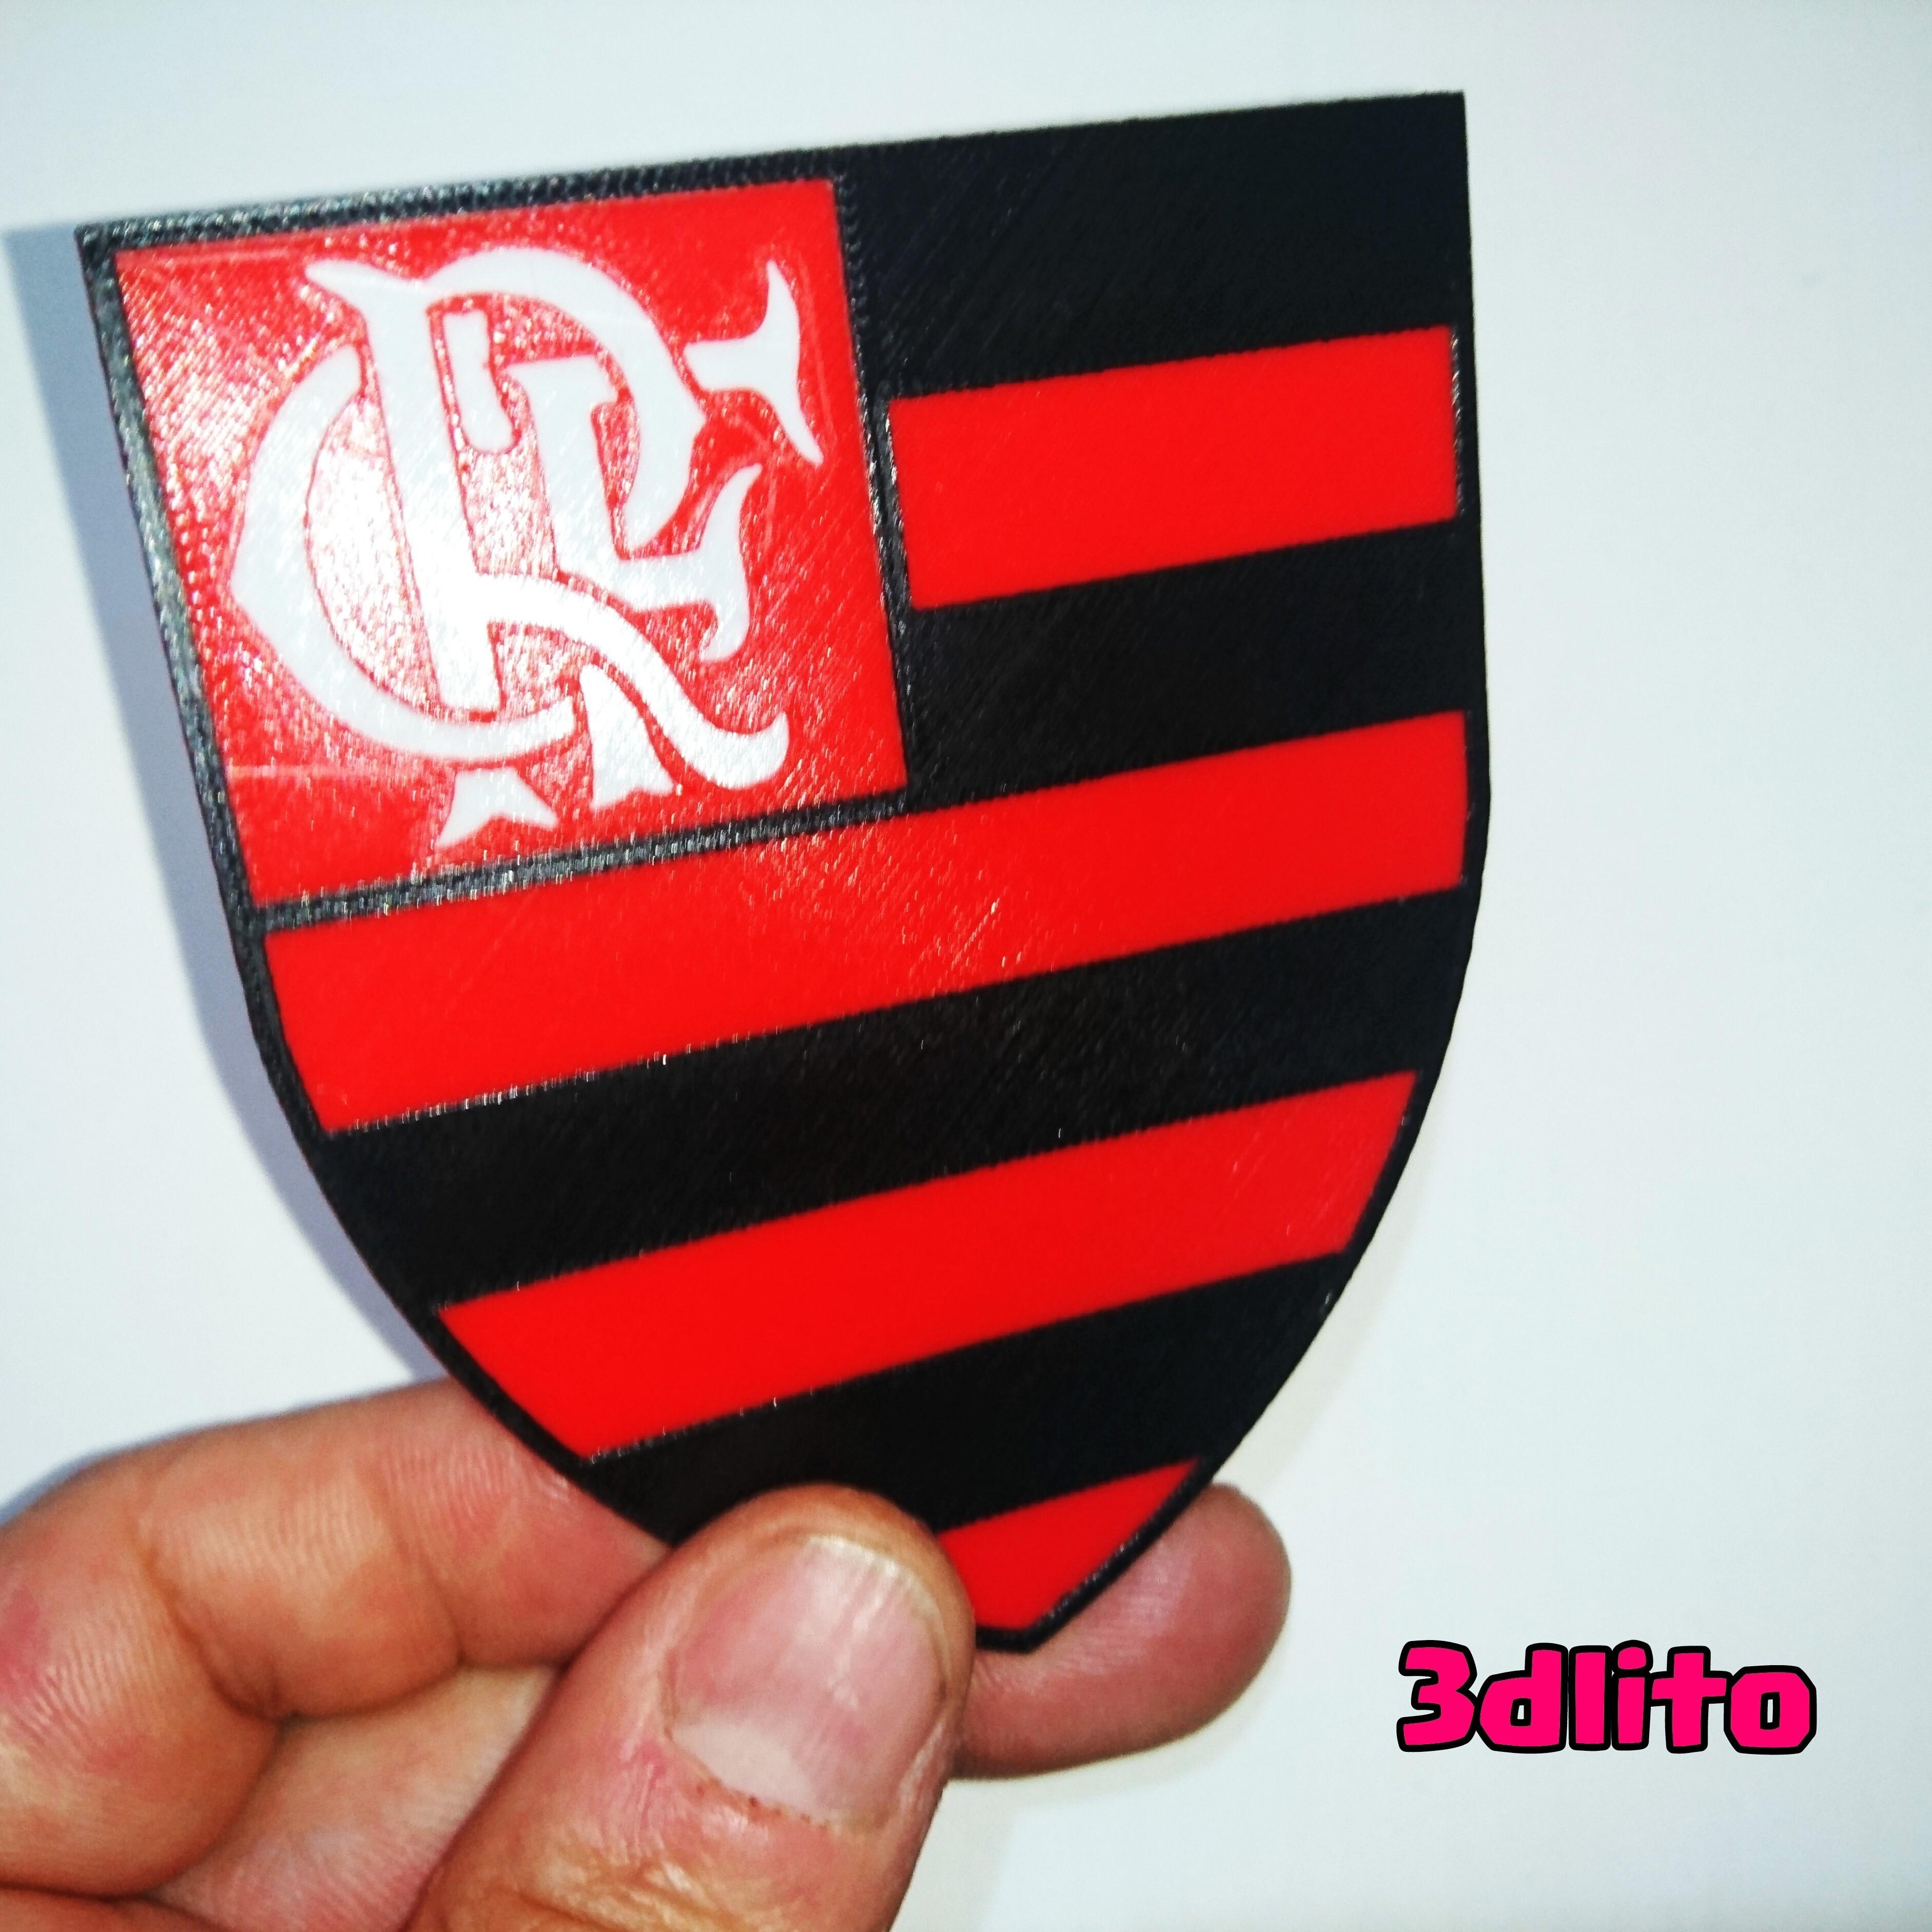 photostudio_1493538563873.jpg Download free STL file Flamenco Shield 3 colors • 3D printer template, 3dlito